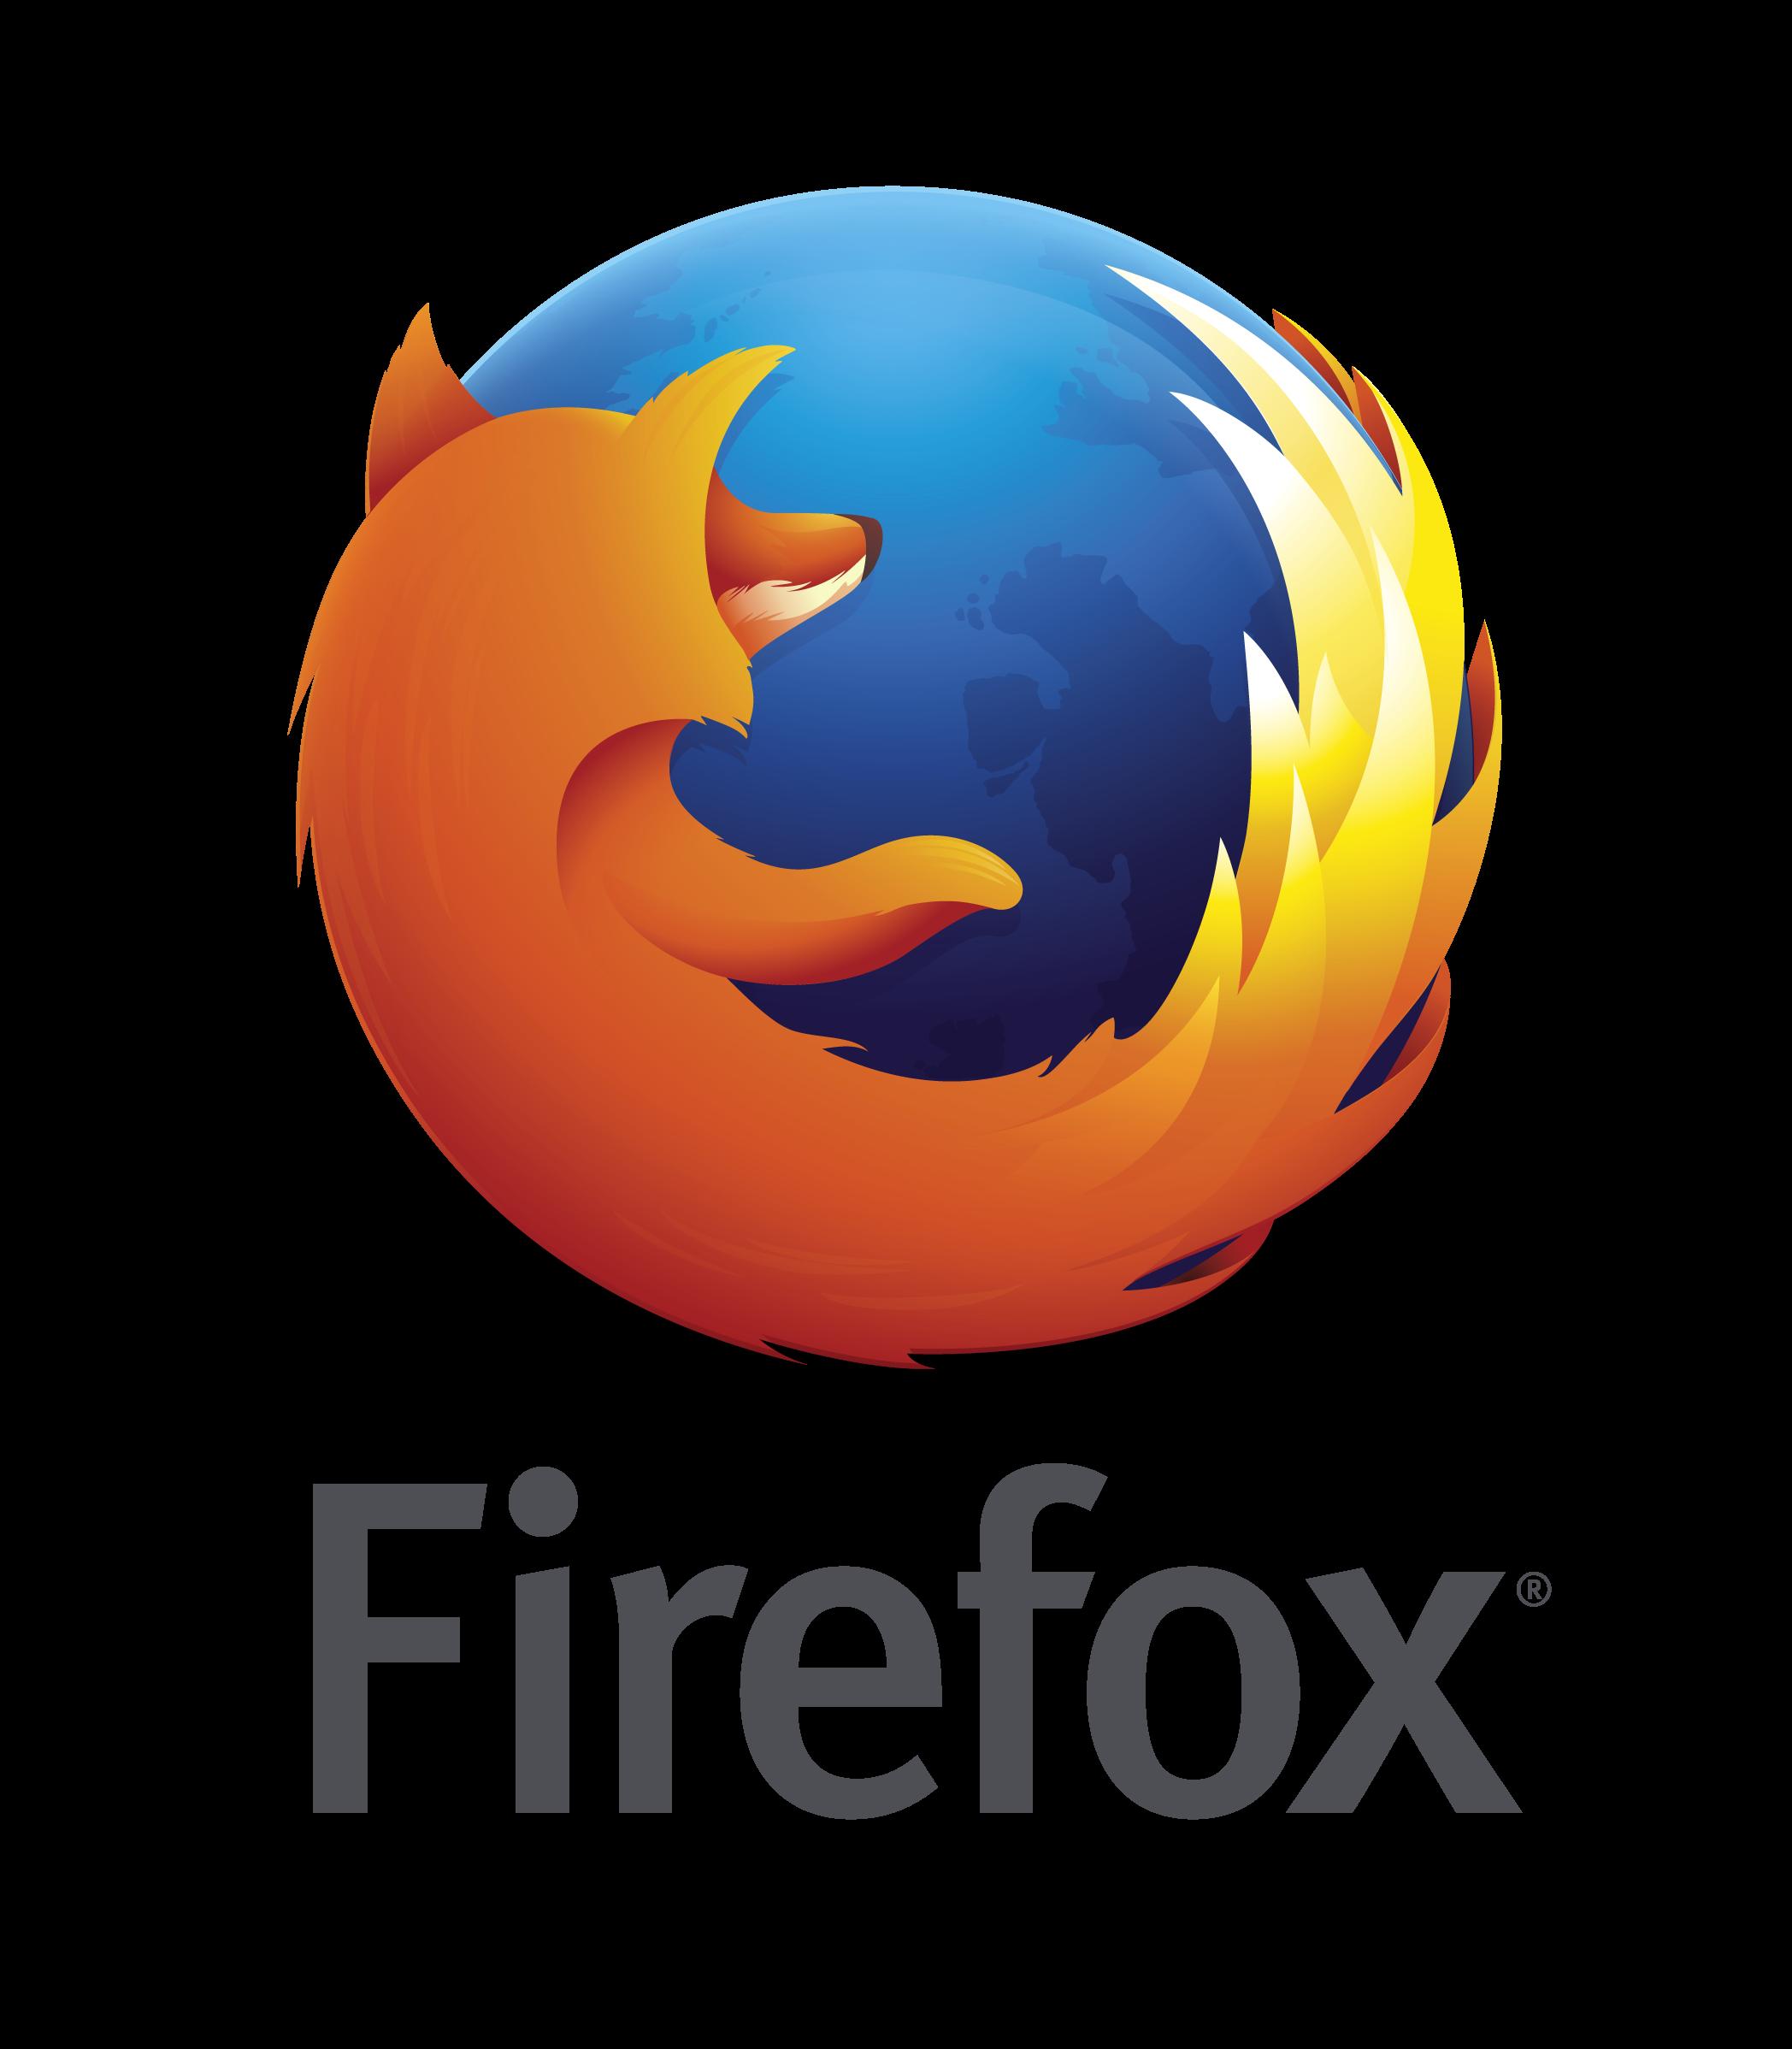 download firefox version 21.0